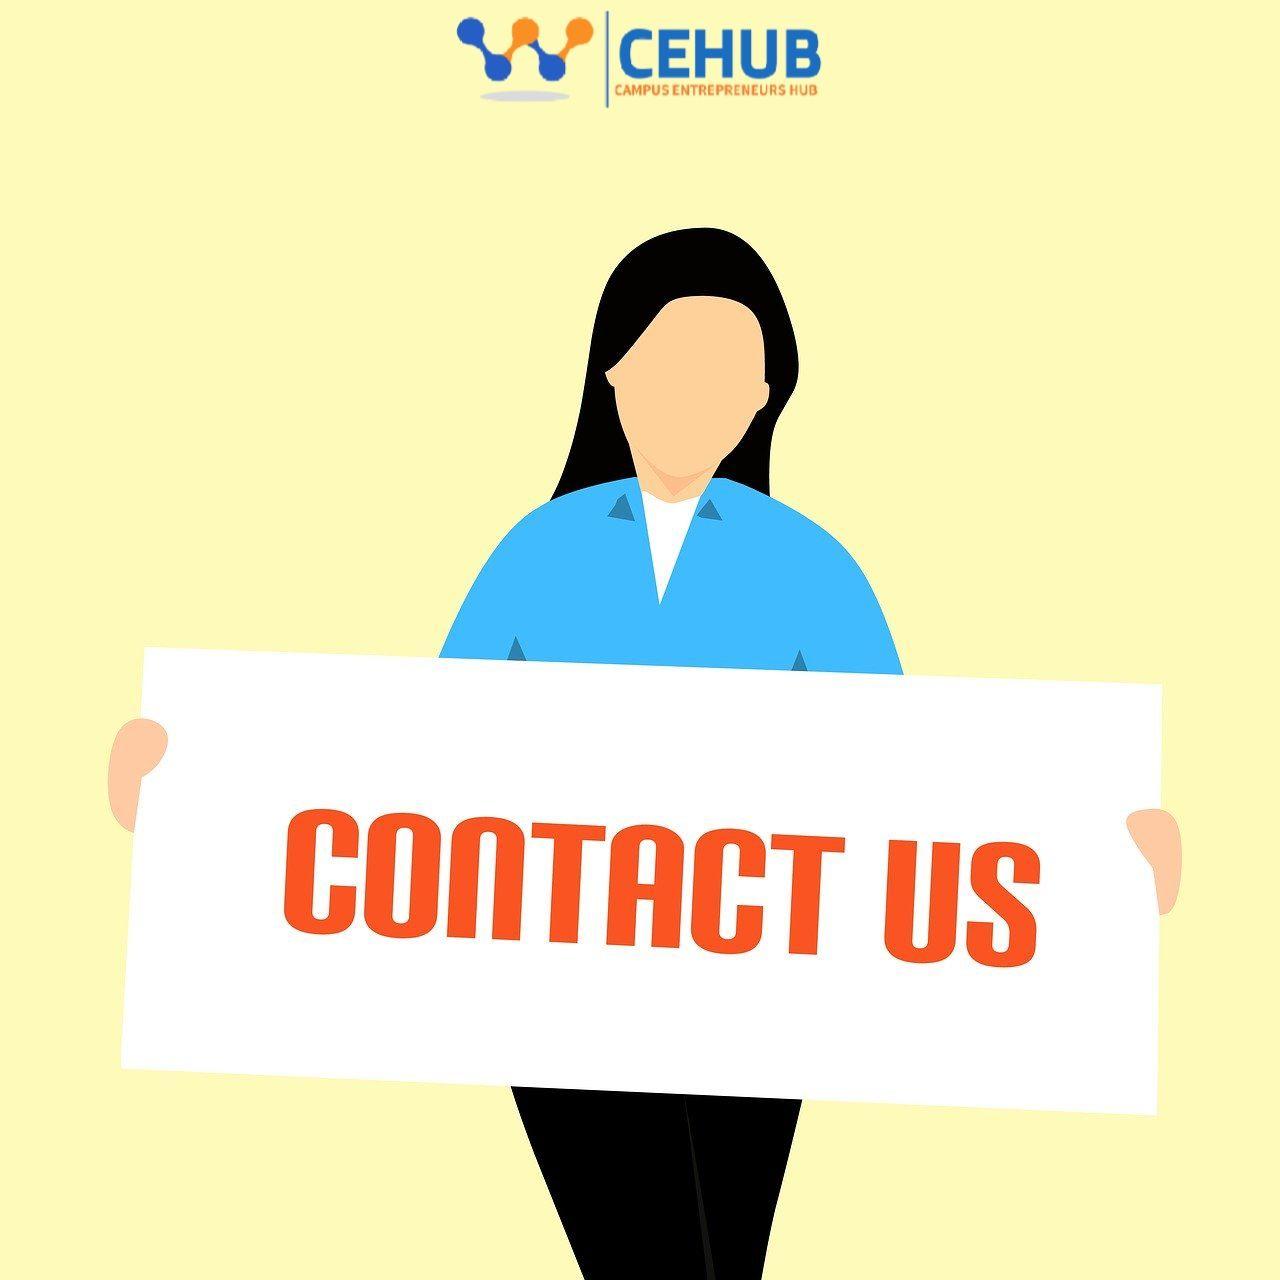 Contact campus entrepreneurs hub